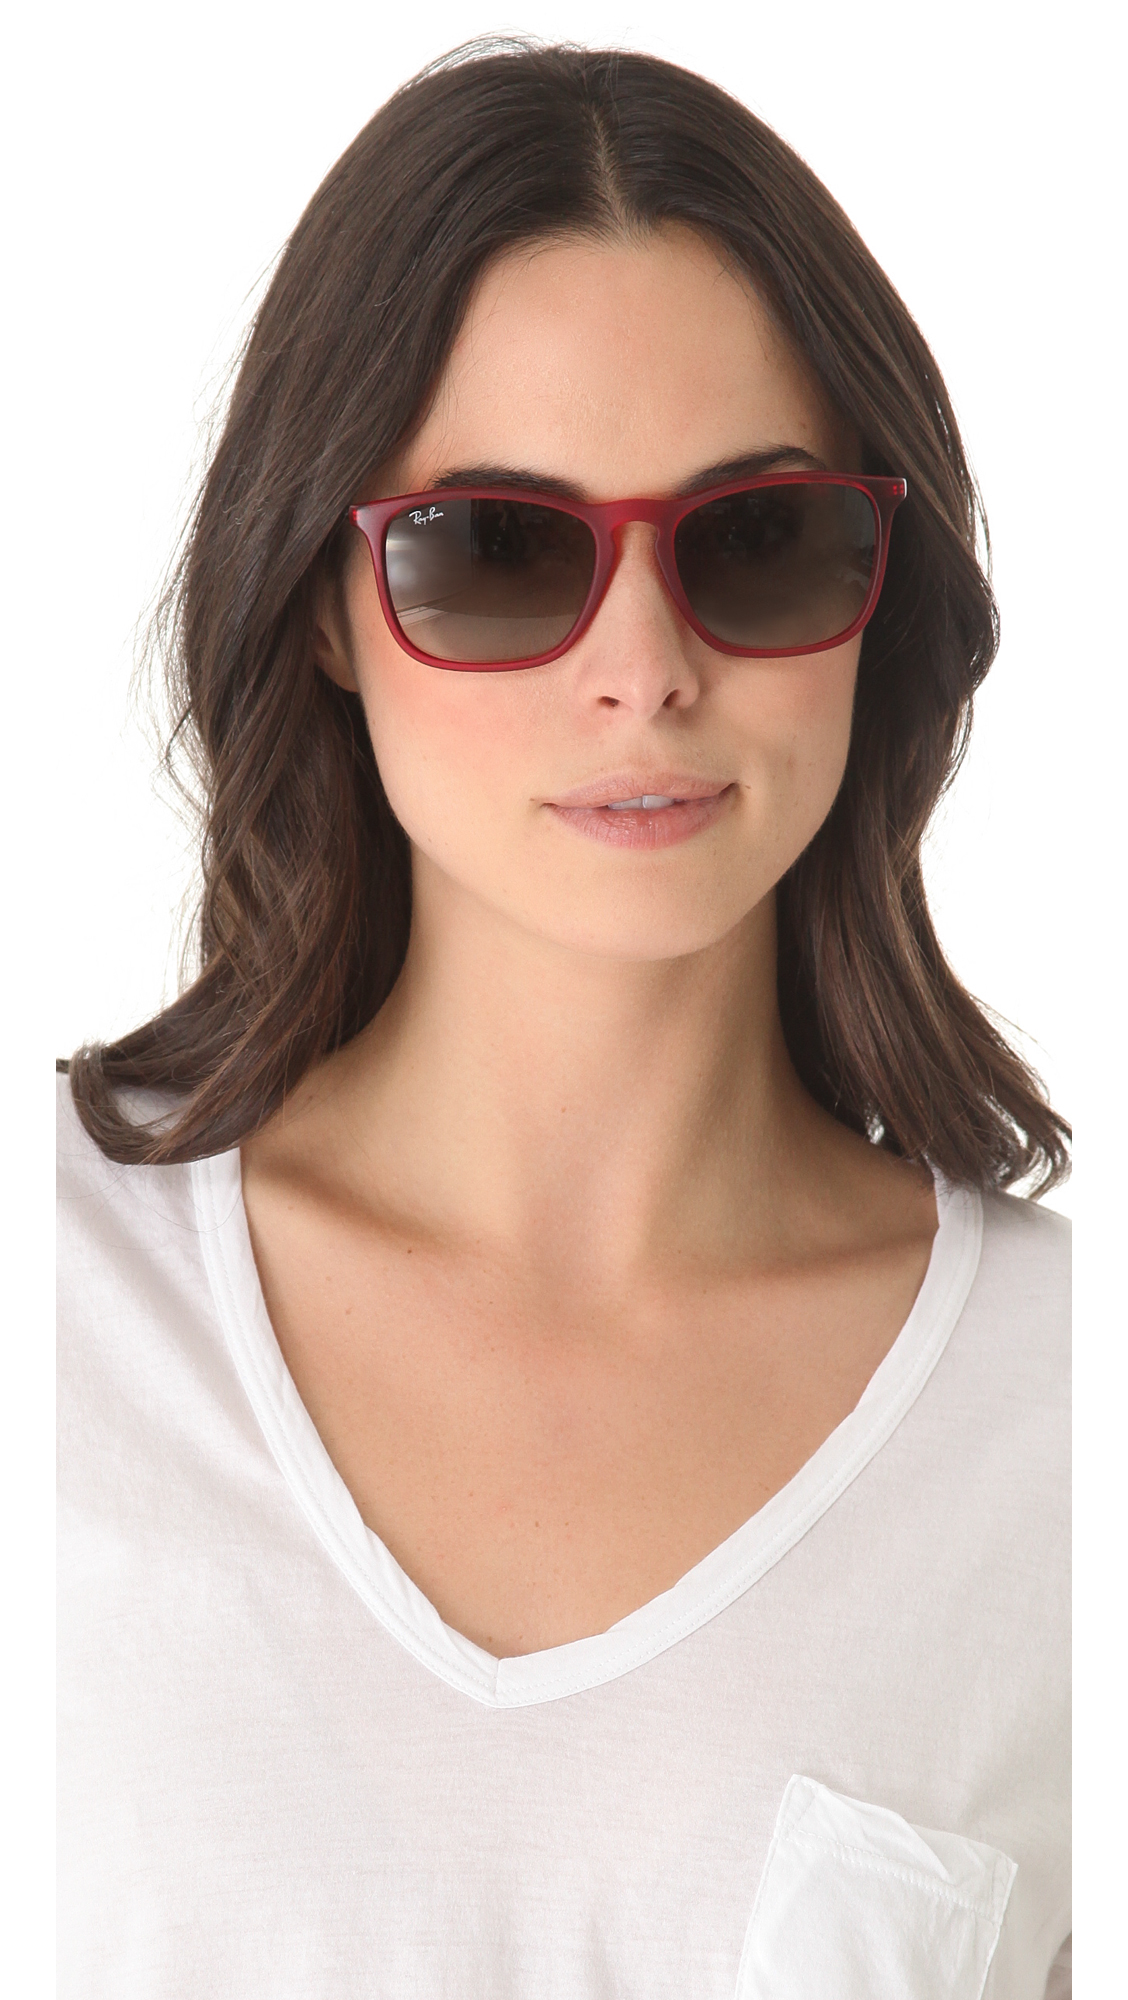 Ray ban sunglasses gradient - Ray Ban Sunglasses Gradient 21